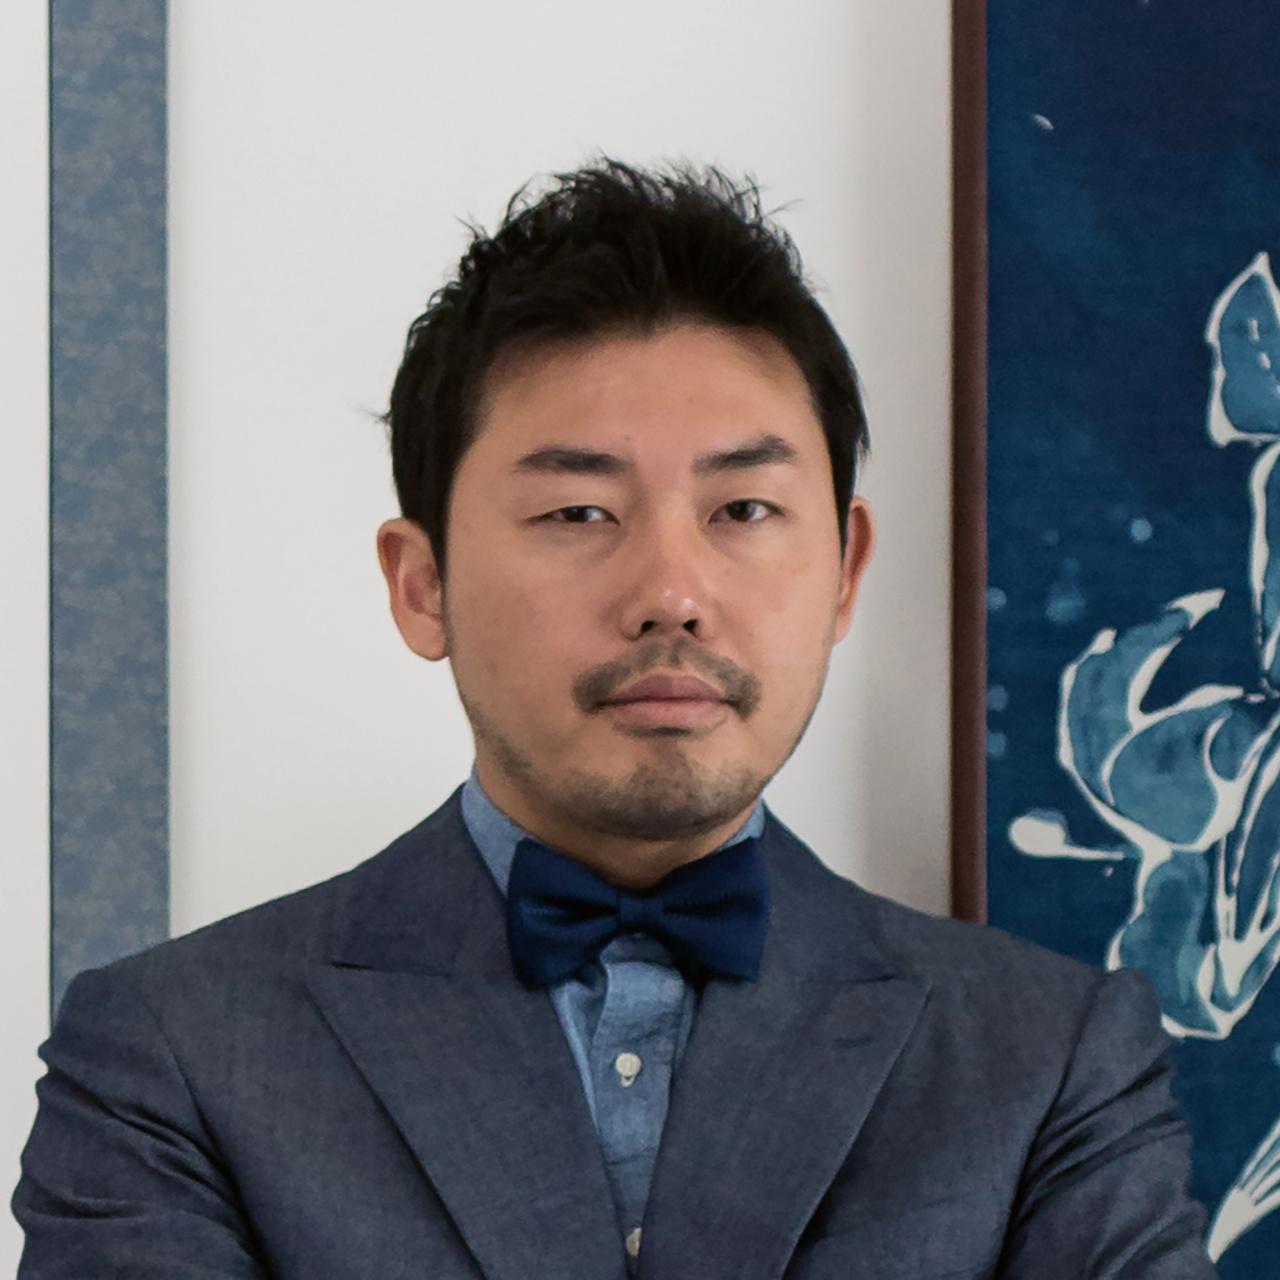 Katsu Manabe